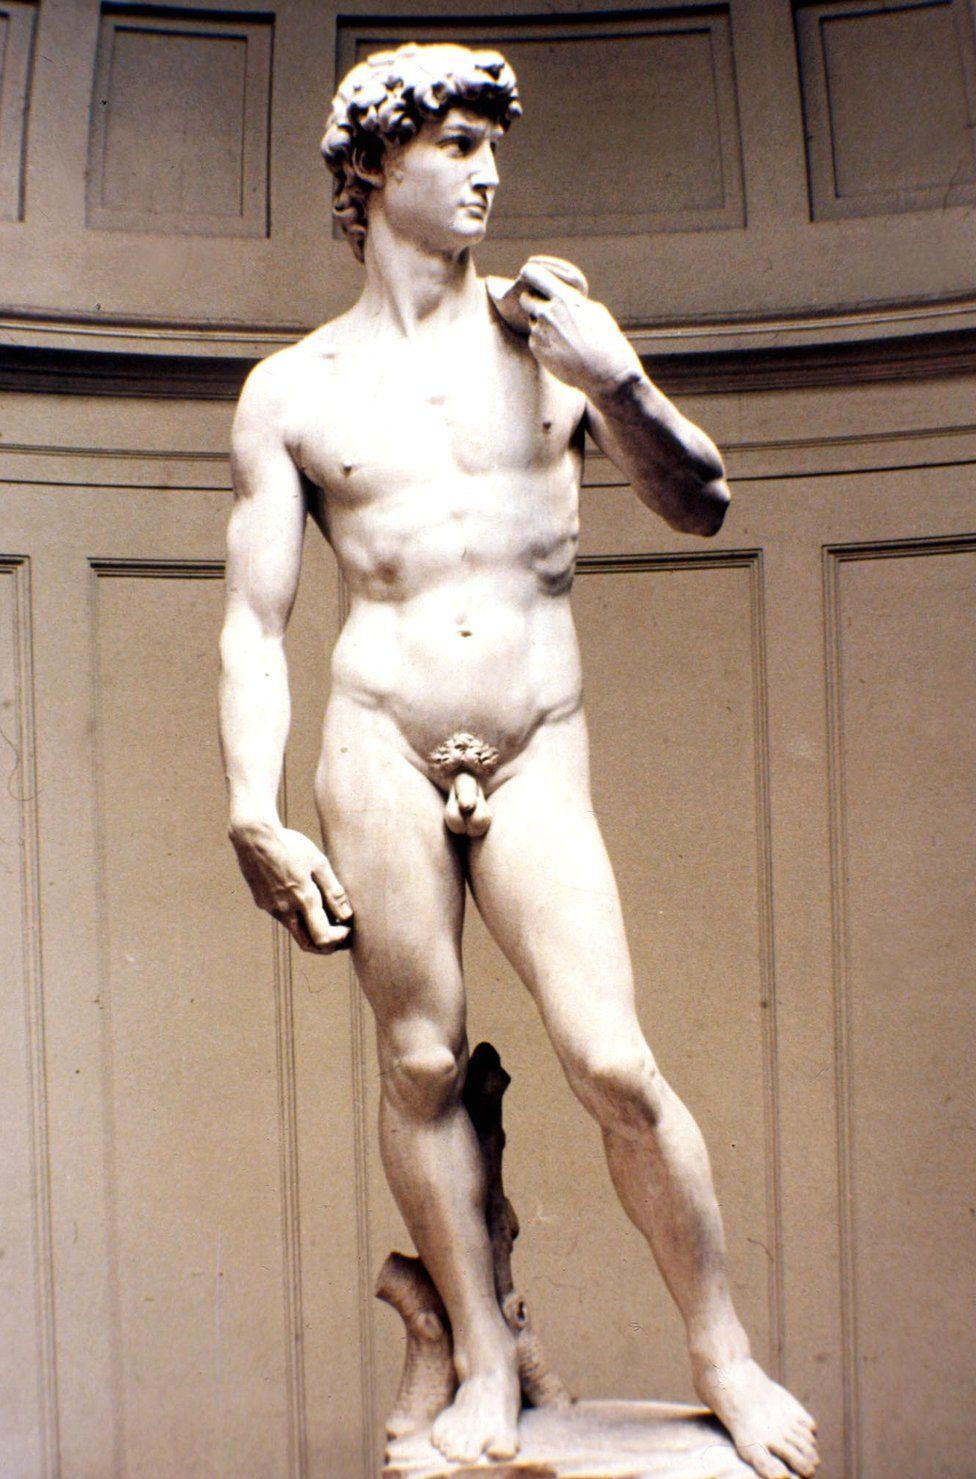 Michelangelo's marble statue of David